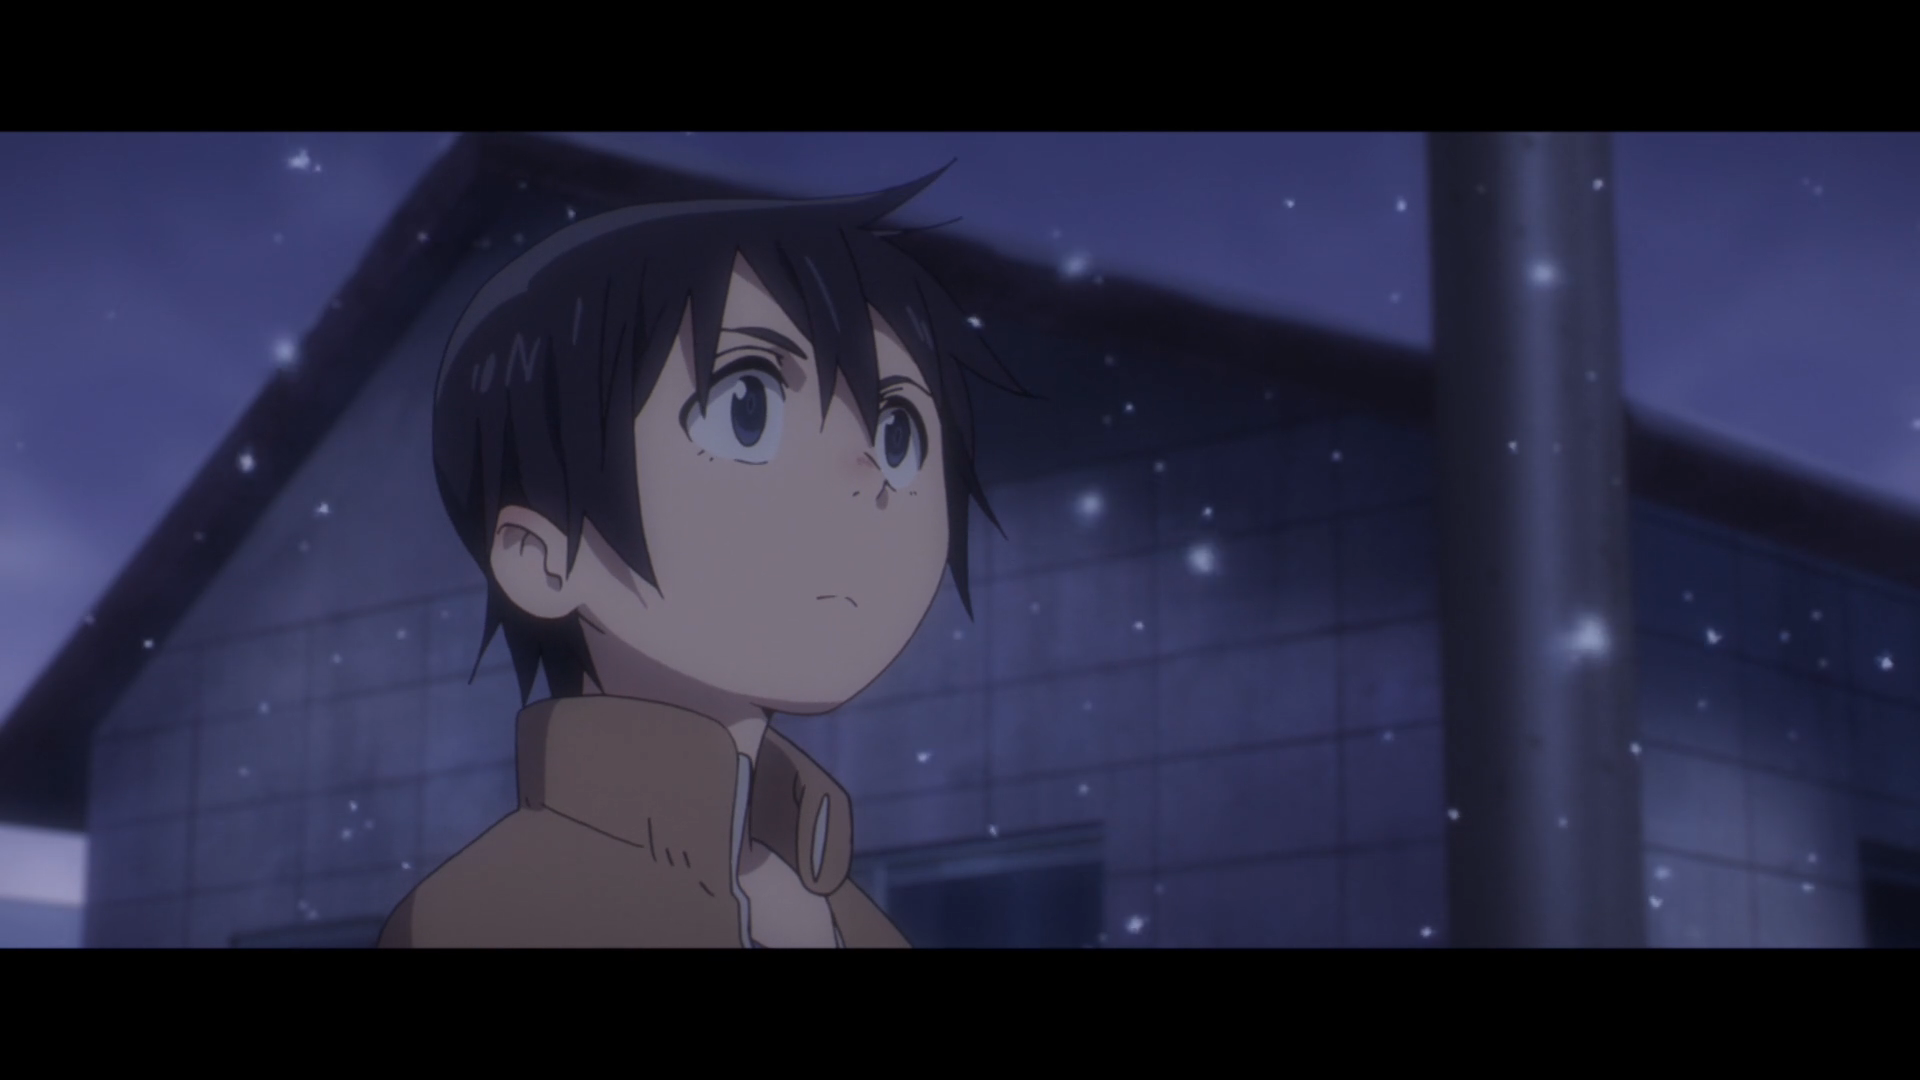 Erased episode 9 satoru looking up at the wintry sky